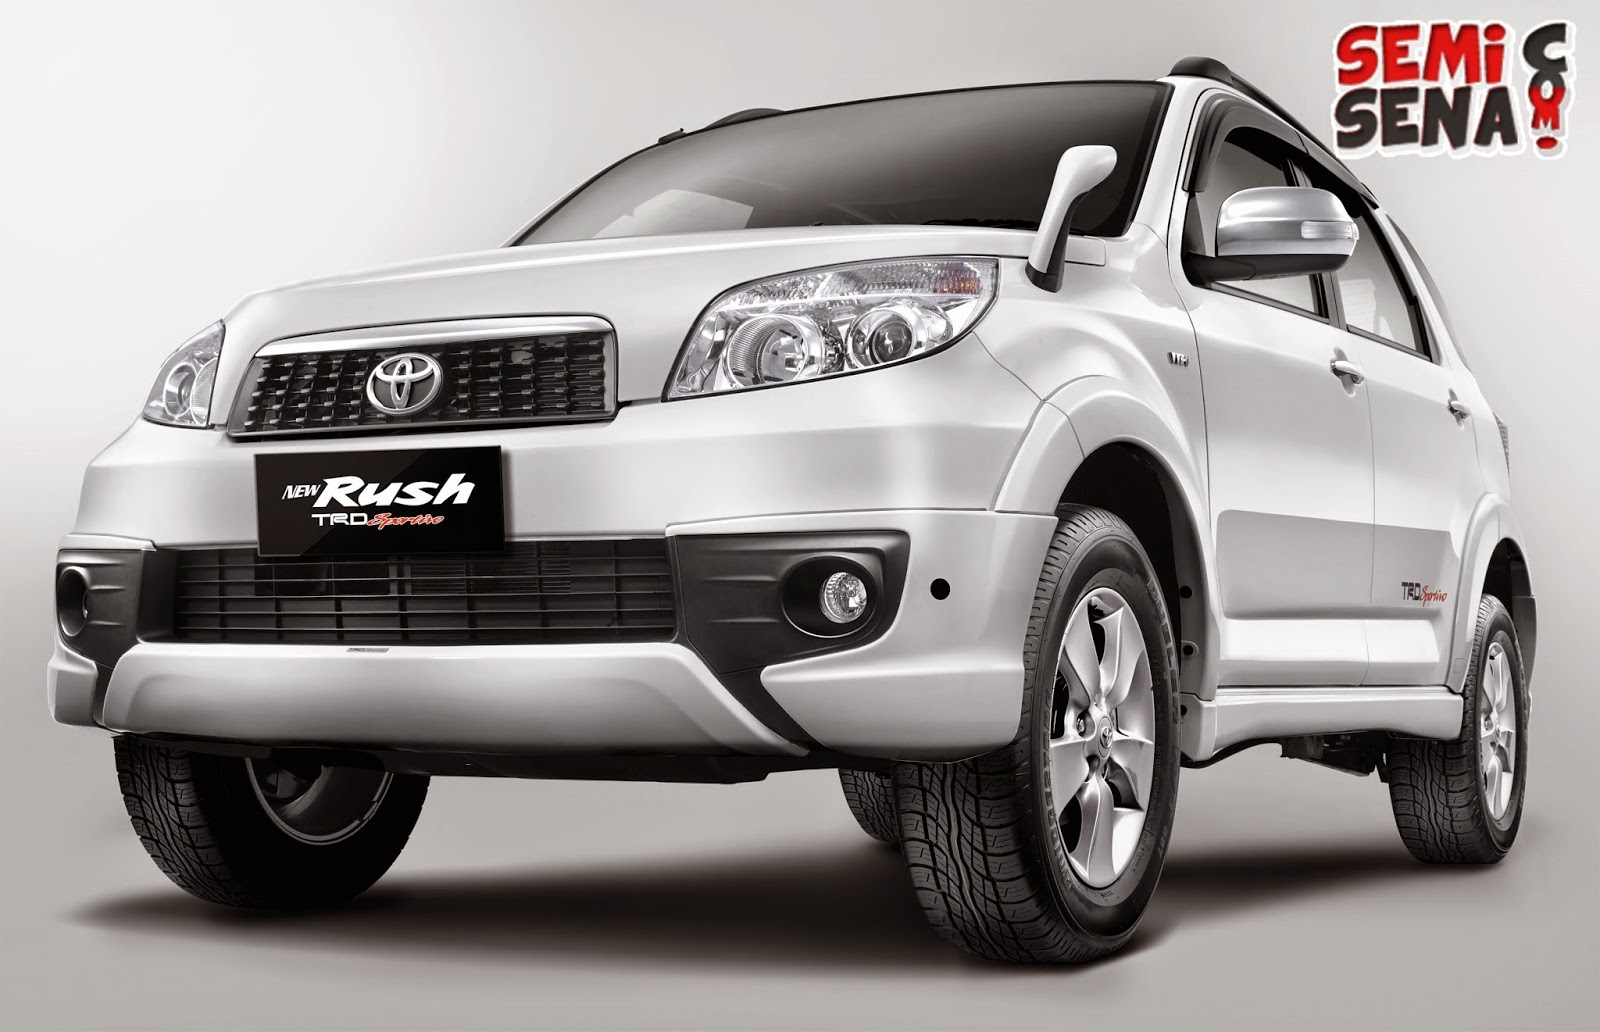 Toyota Yaris Trd Sportivo Specs Grand New Veloz Warna Hitam Specifications And Latest Price Rush